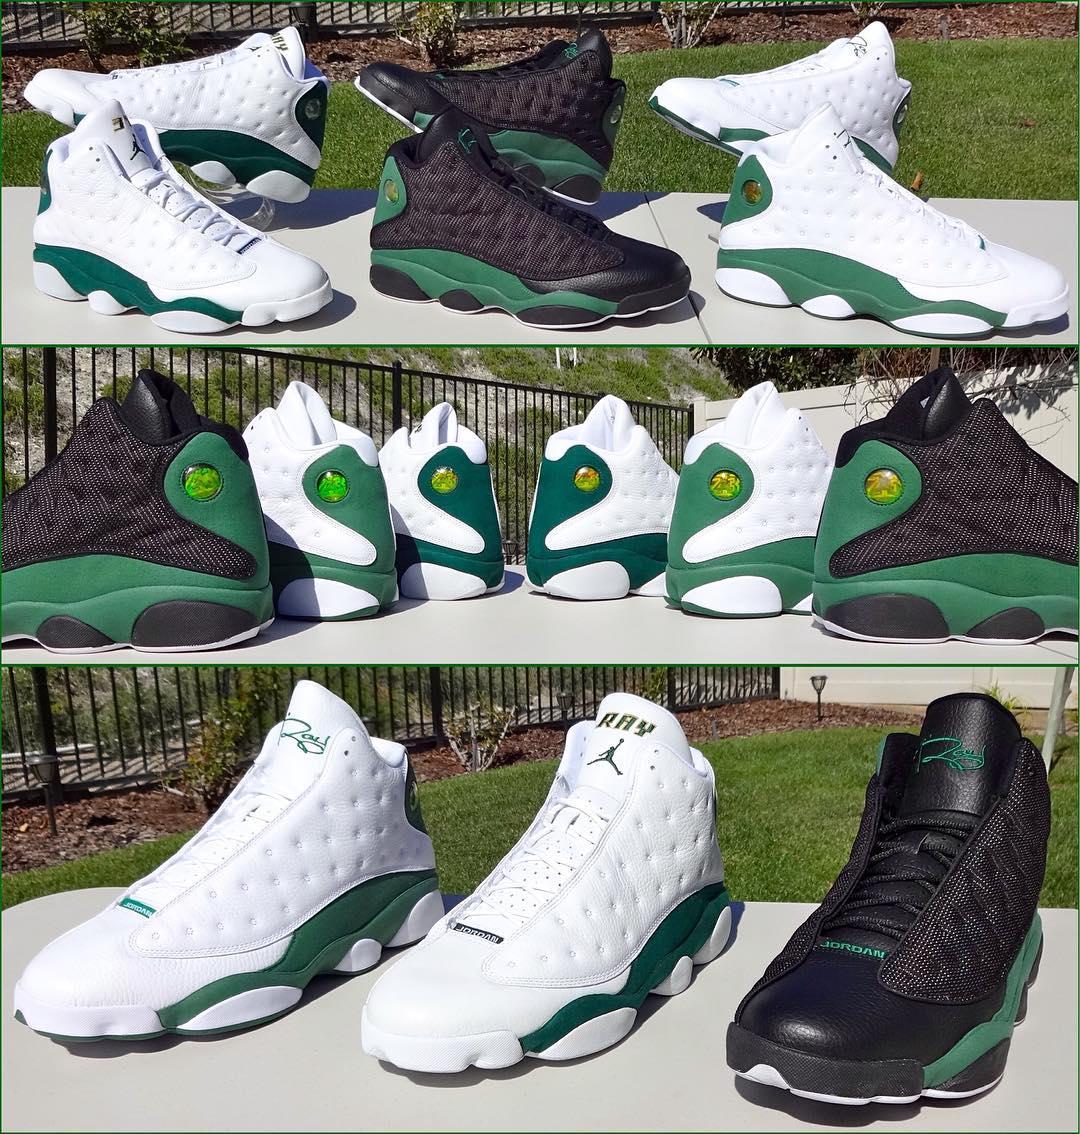 ray allen Air Jordan 13 Retro - Boston Celtics Home/Away PE